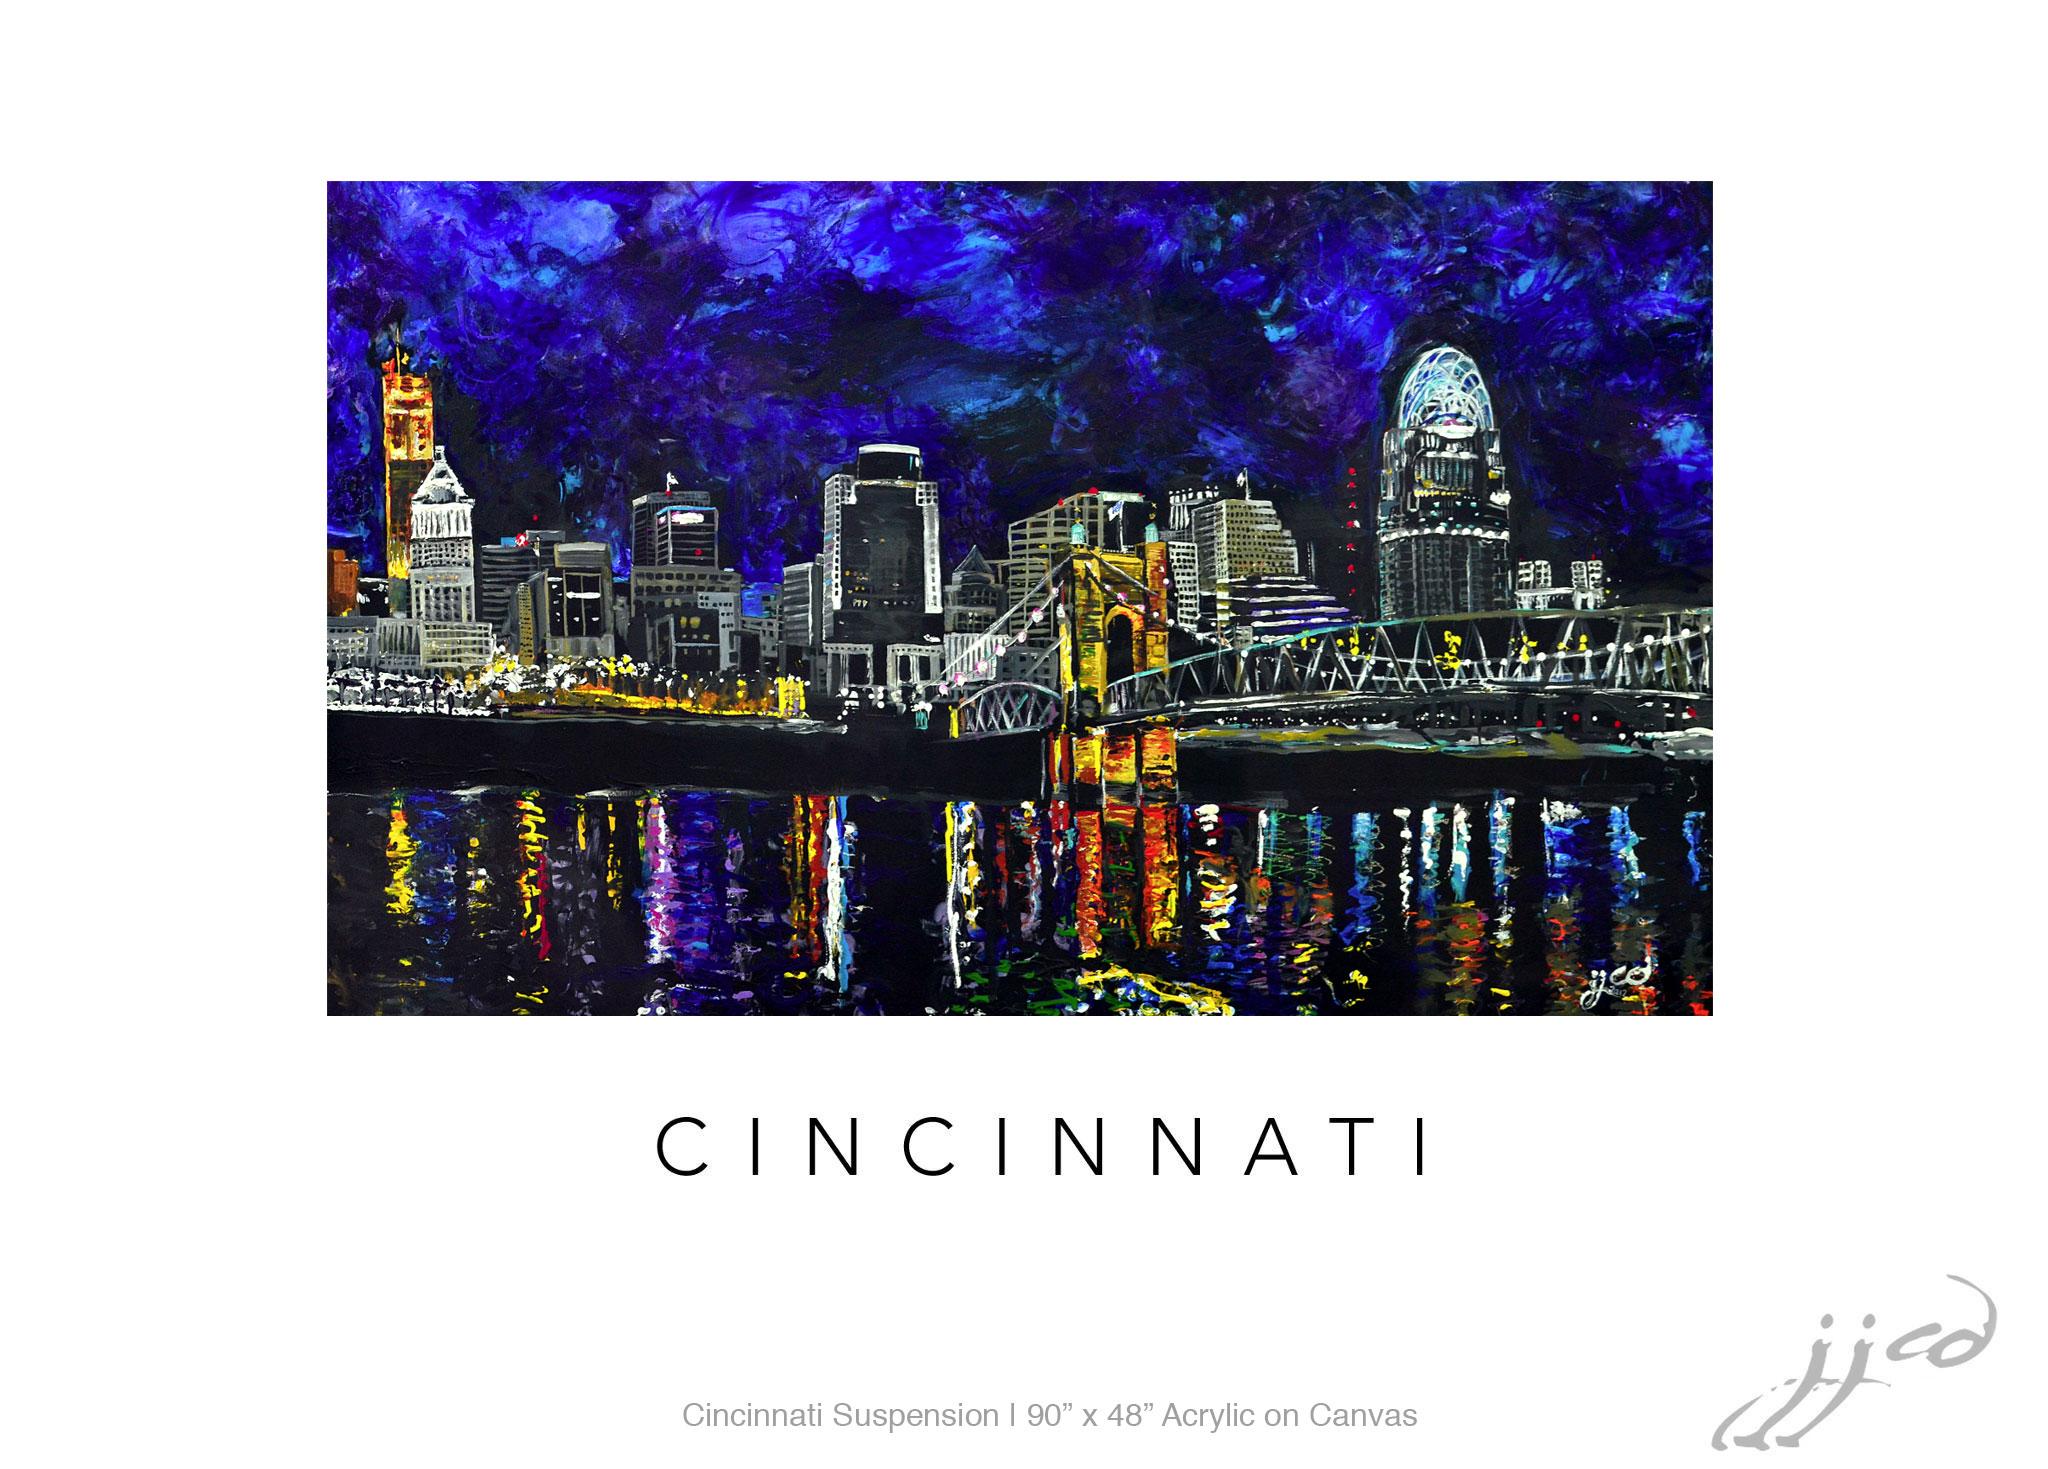 CincinnatiSuspension